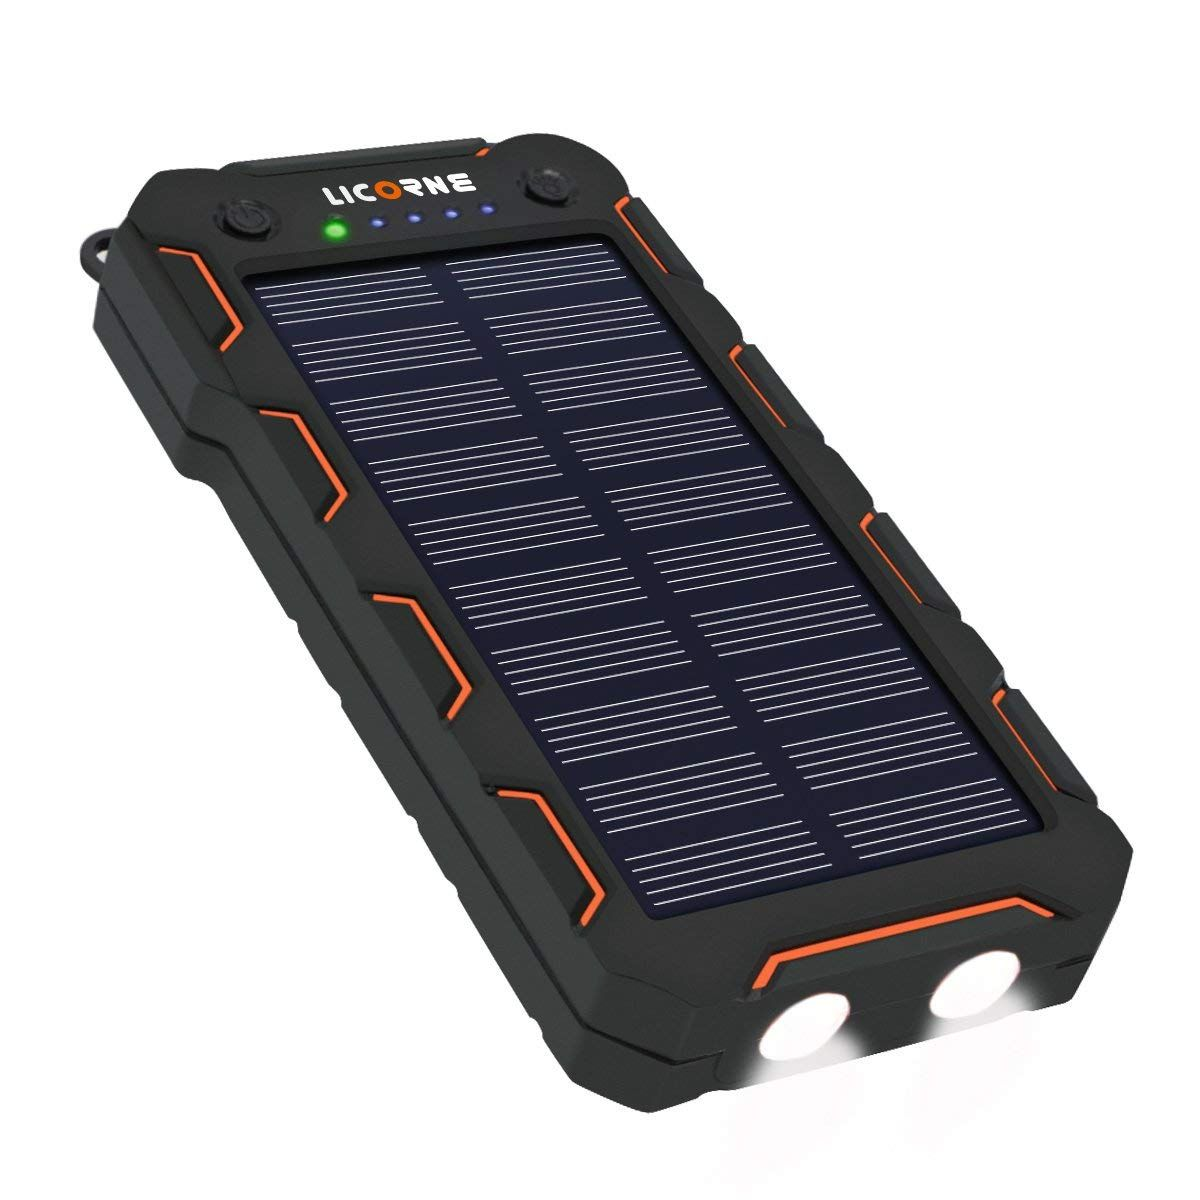 Solar Chargers 15000mah Portable Solar Power Bank High Efficiency Sunpower Cellphone Chargers Ra Solar Panel Charger Solar Battery Charger Portable Solar Power